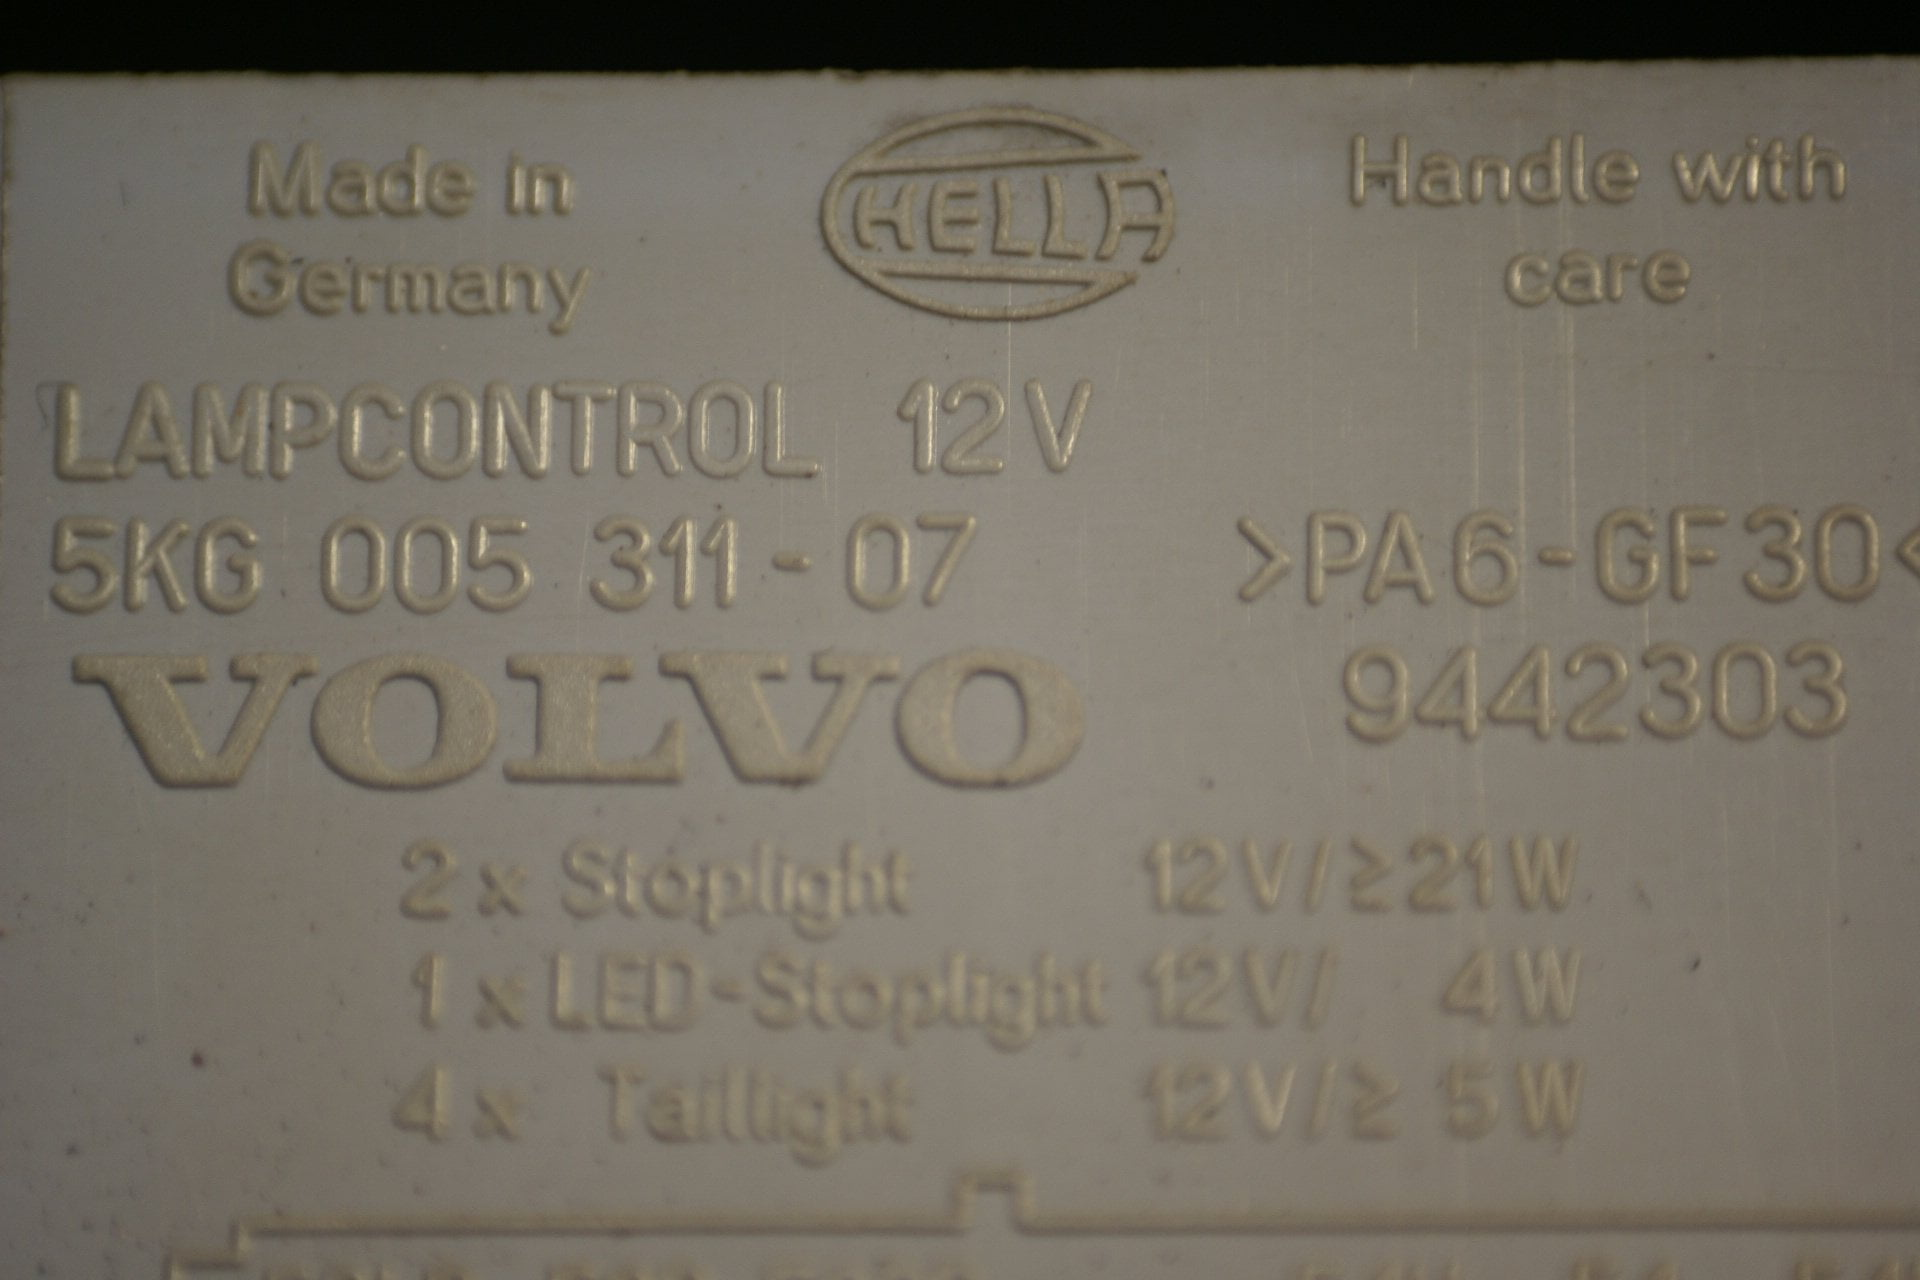 DSC00954 Volvo relais lampcontrol 9442303